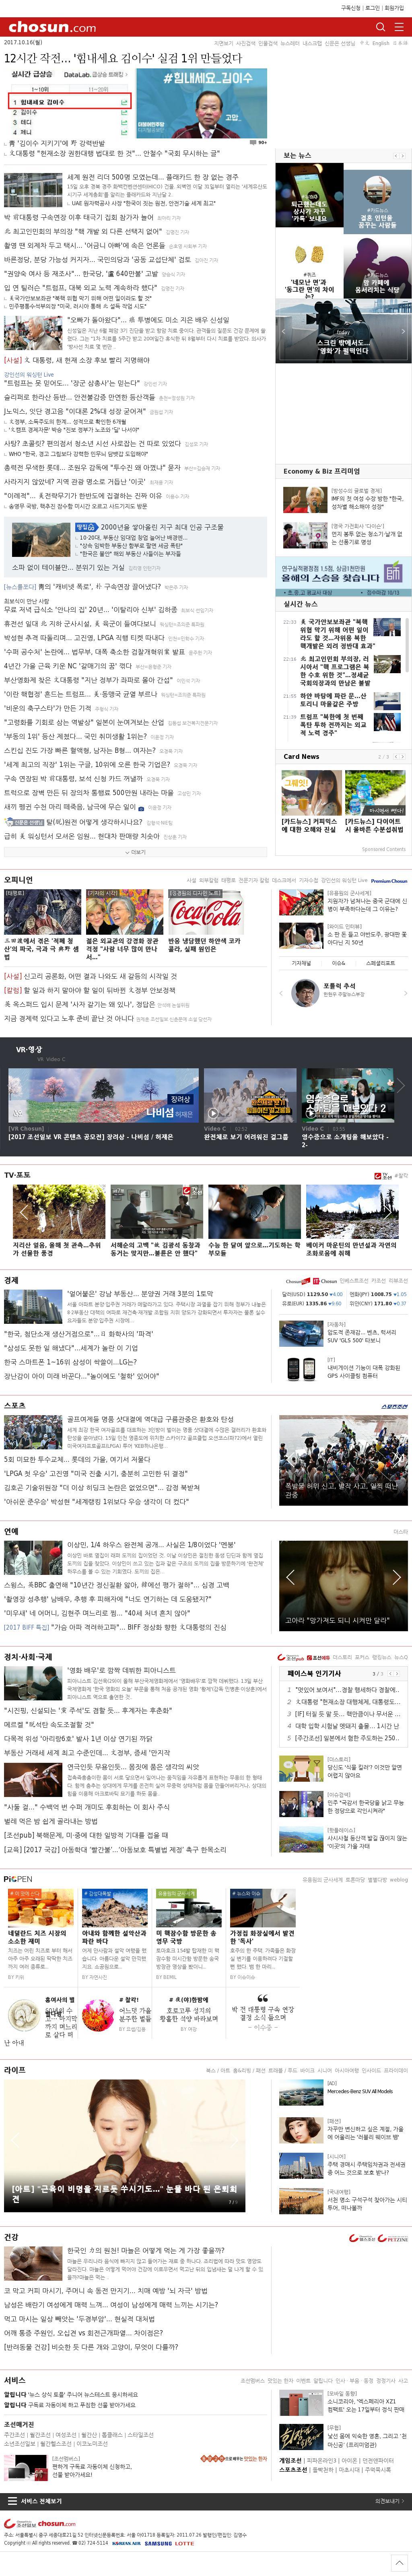 chosun.com at Sunday Oct. 15, 2017, 11:01 p.m. UTC